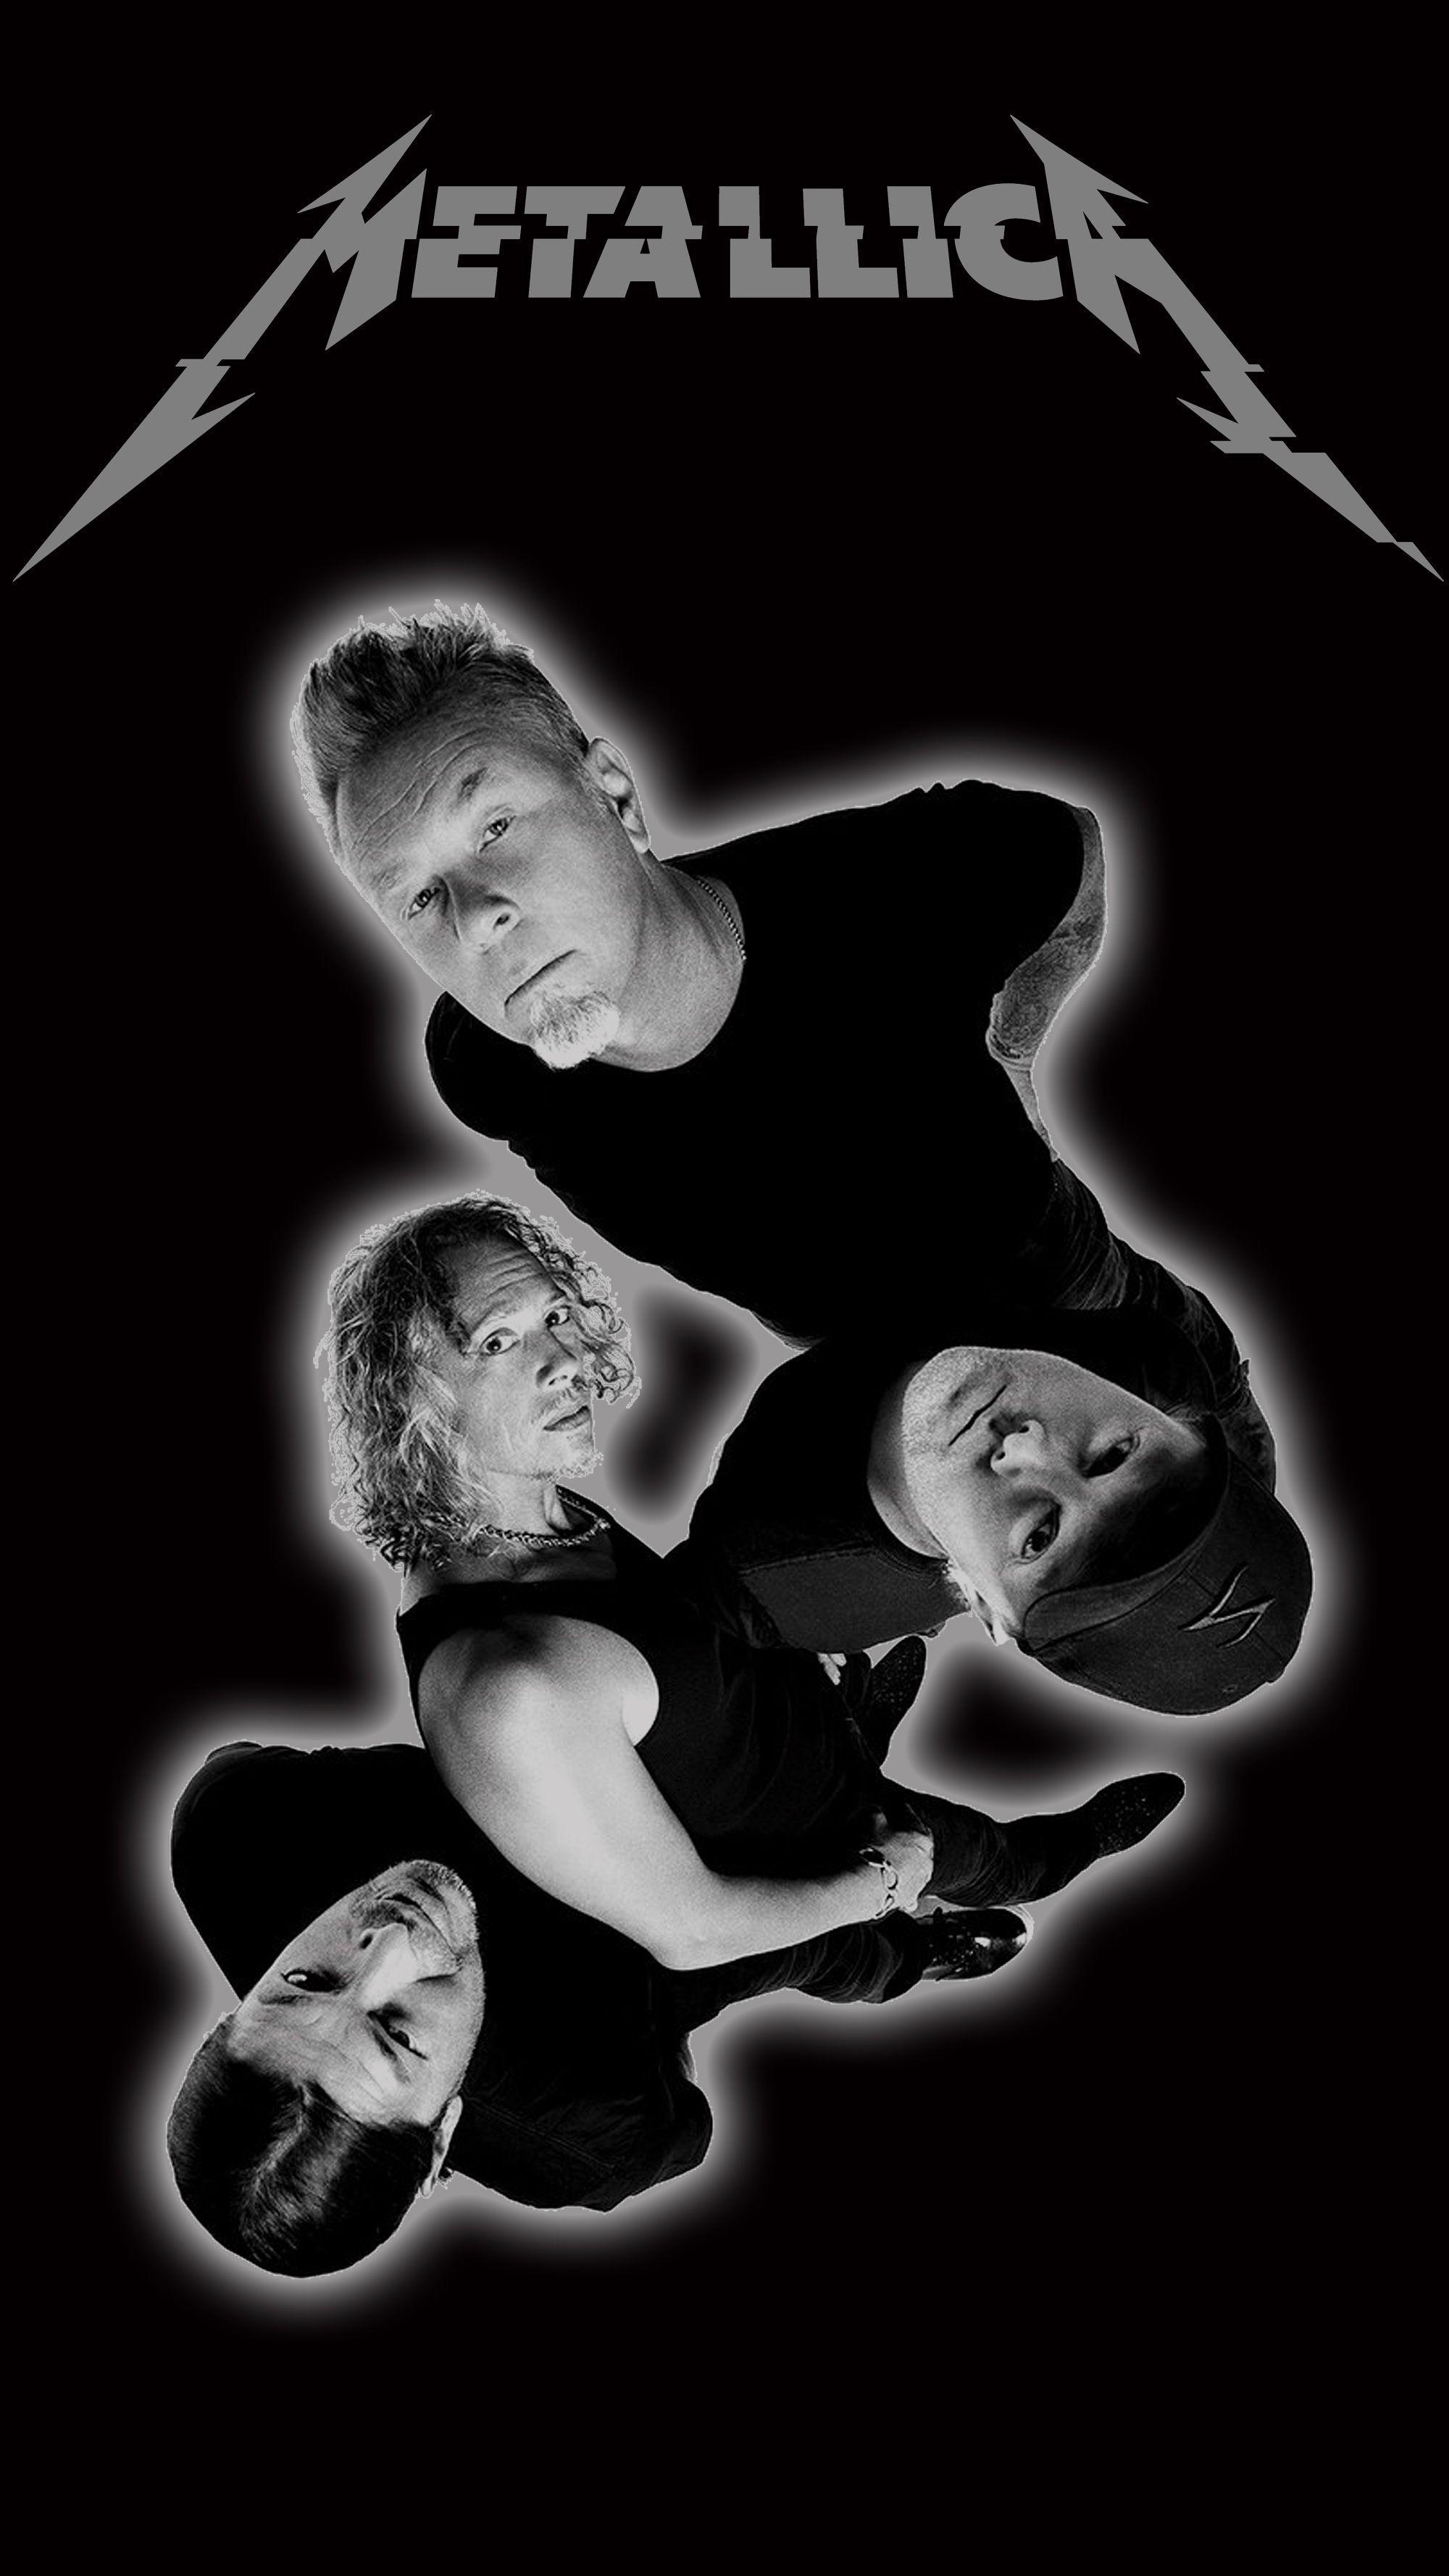 Elegant Metallica Papel De Parede Para Celular - wallpaper craft